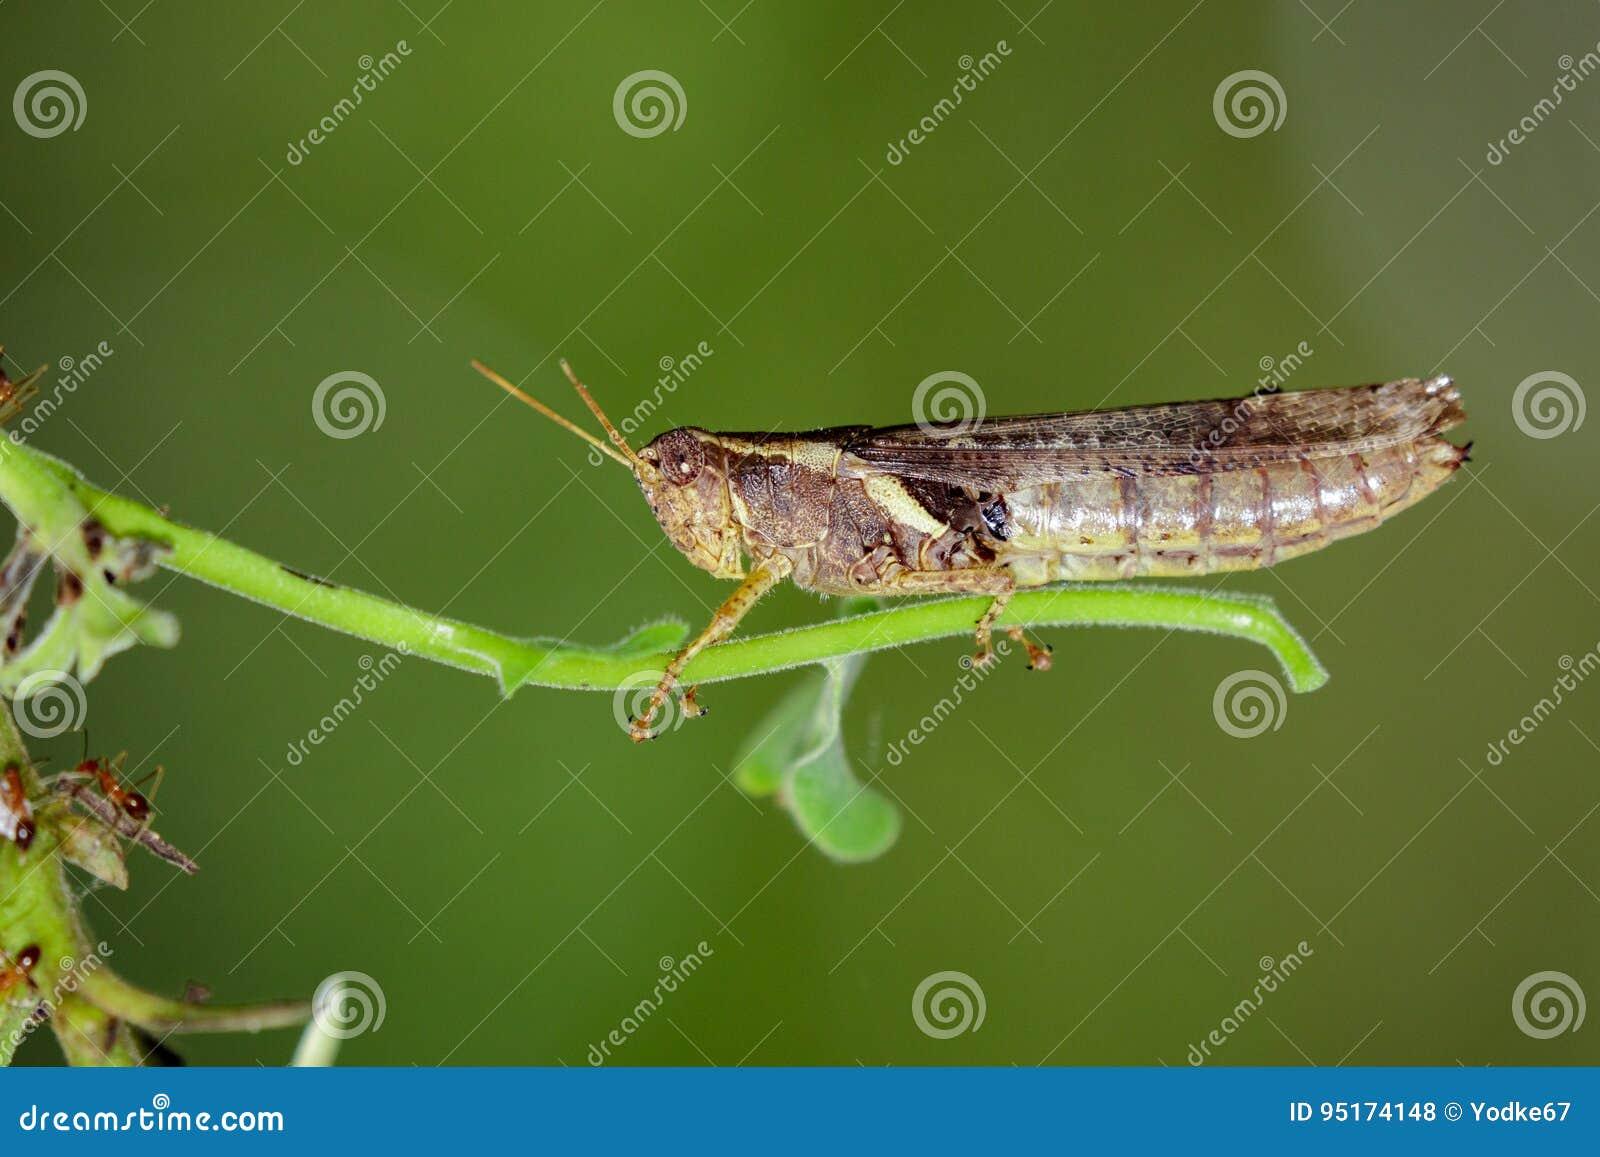 Imagen Del Saltamontes Rufo-legged En Fondo De La Naturaleza Insecto ...